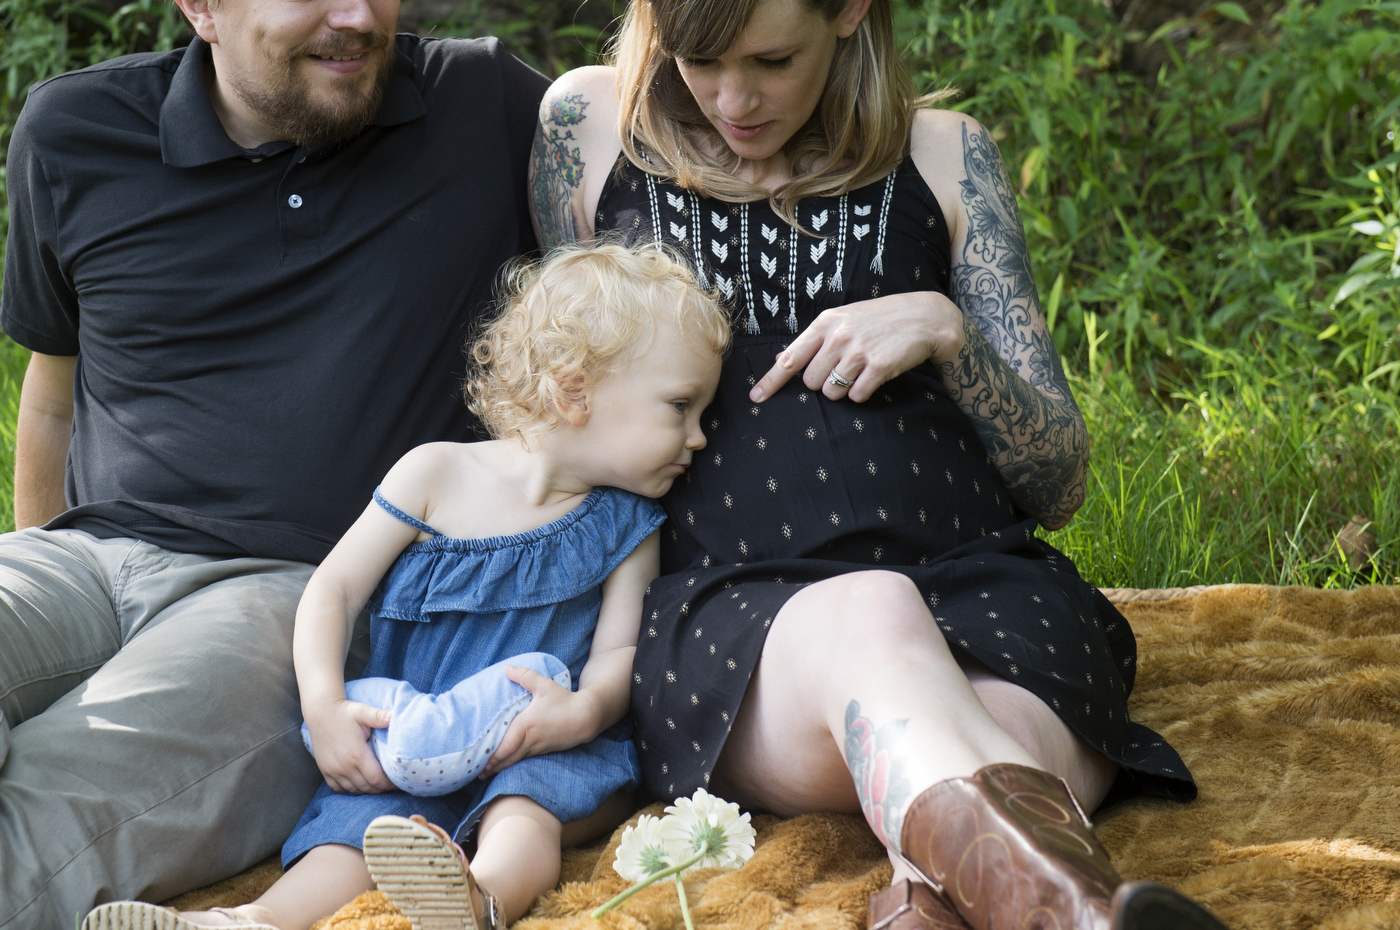 081416_Martin&Kelly&Alice&Baby_blog_73.JPG